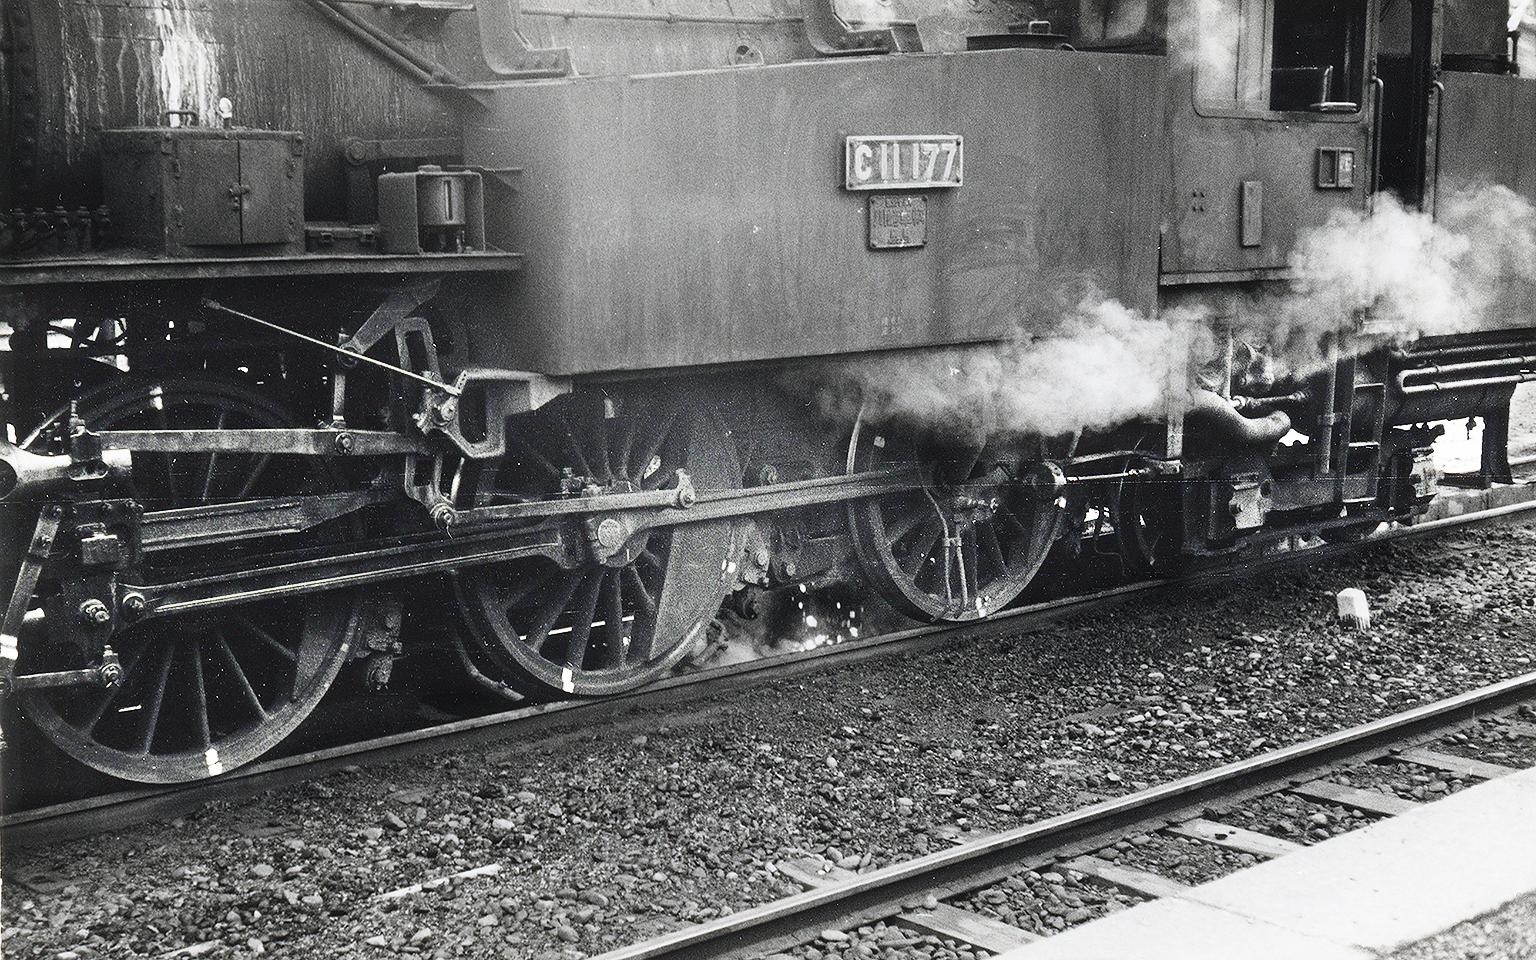 http://moritetsu.info/model-railway/img/w03_C11tanku_sssss.jpg